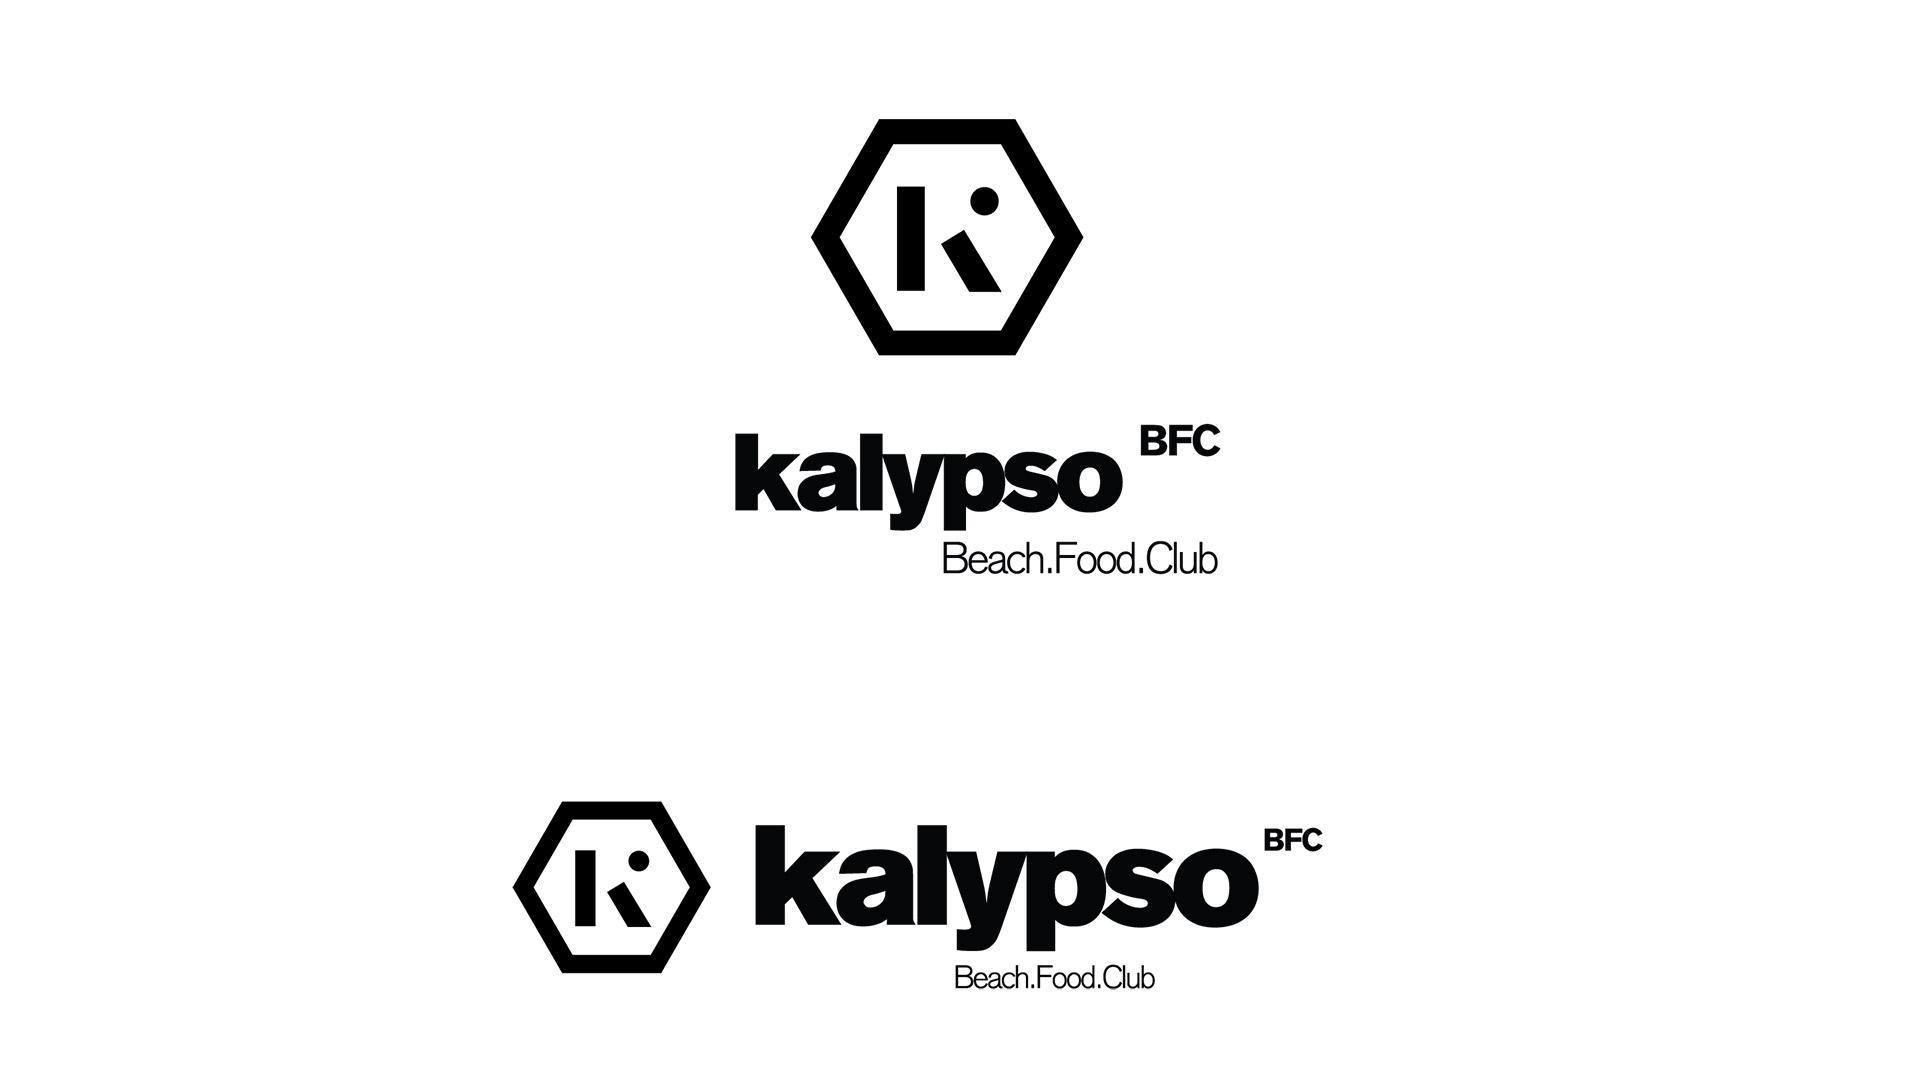 kalypso_port-02